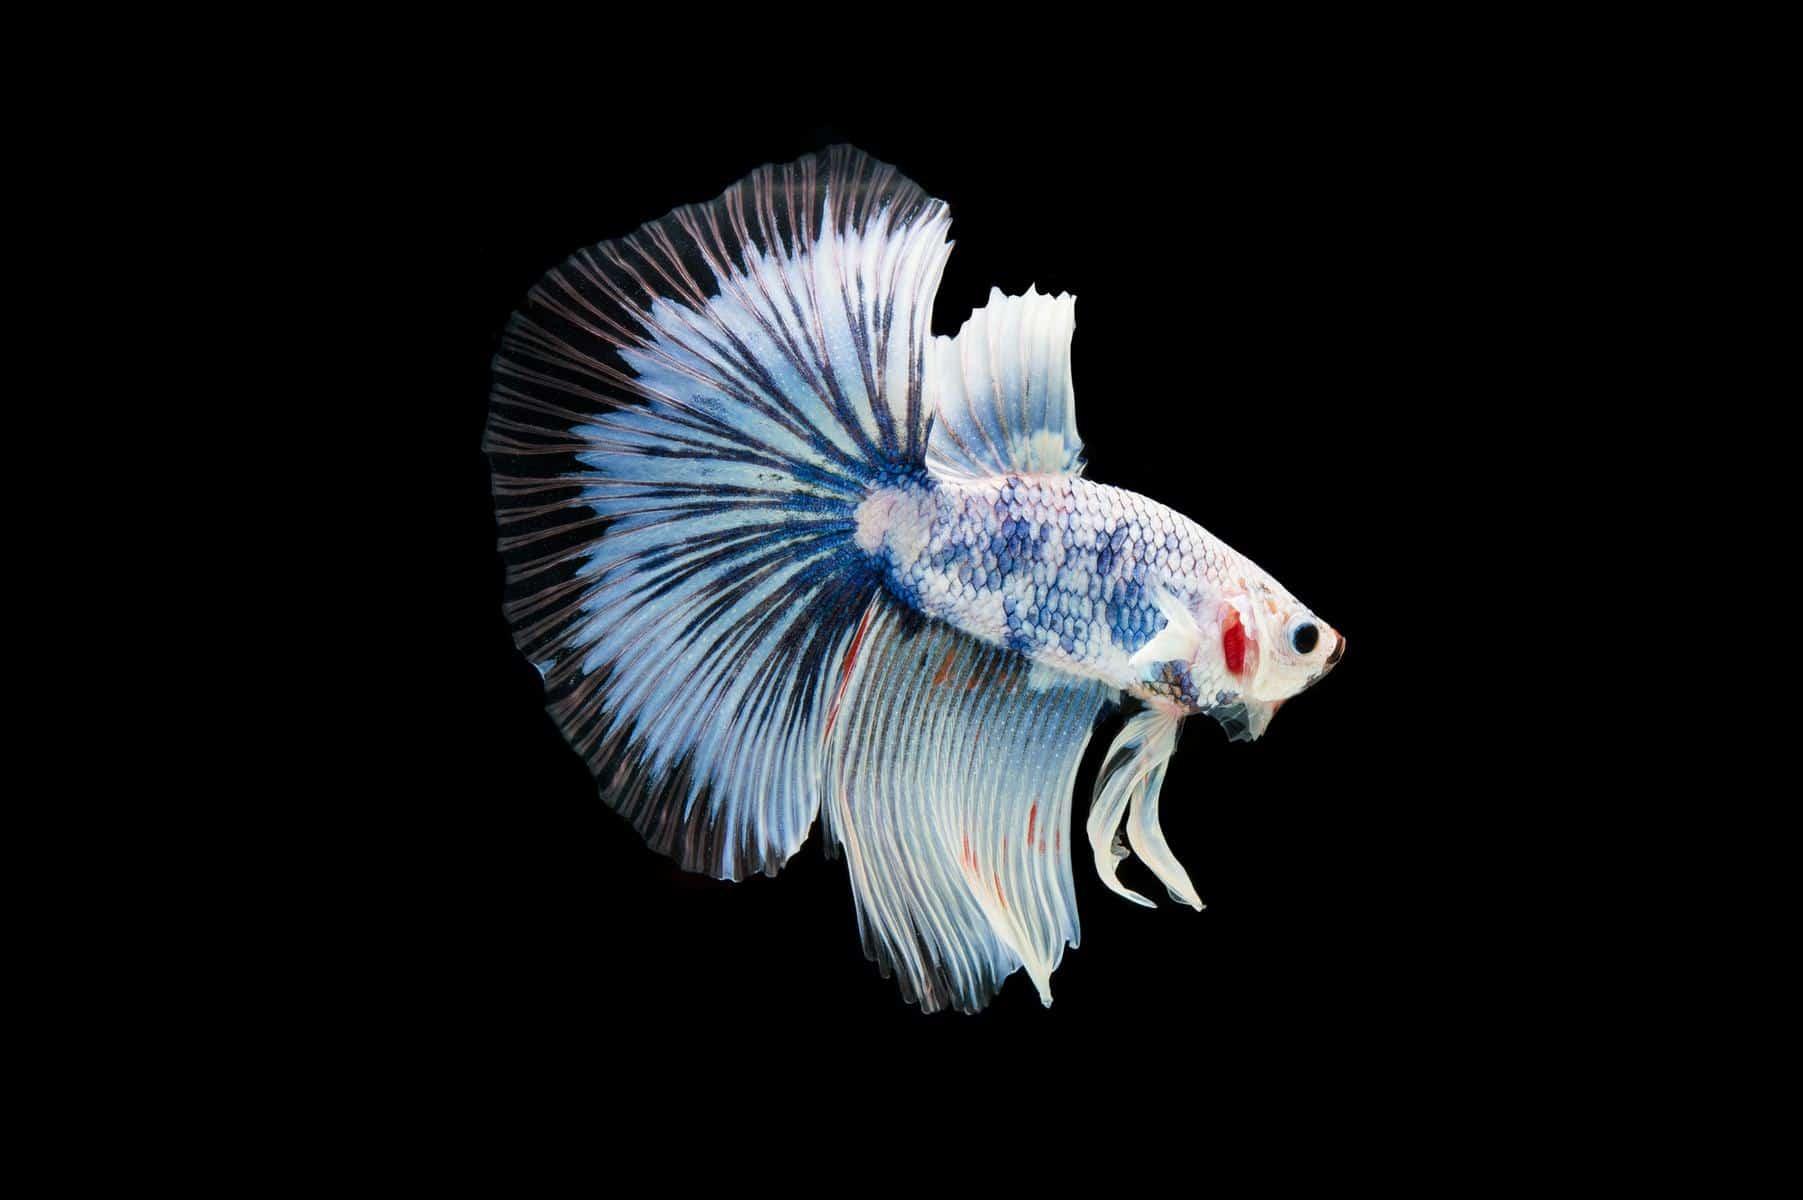 pale betta fish